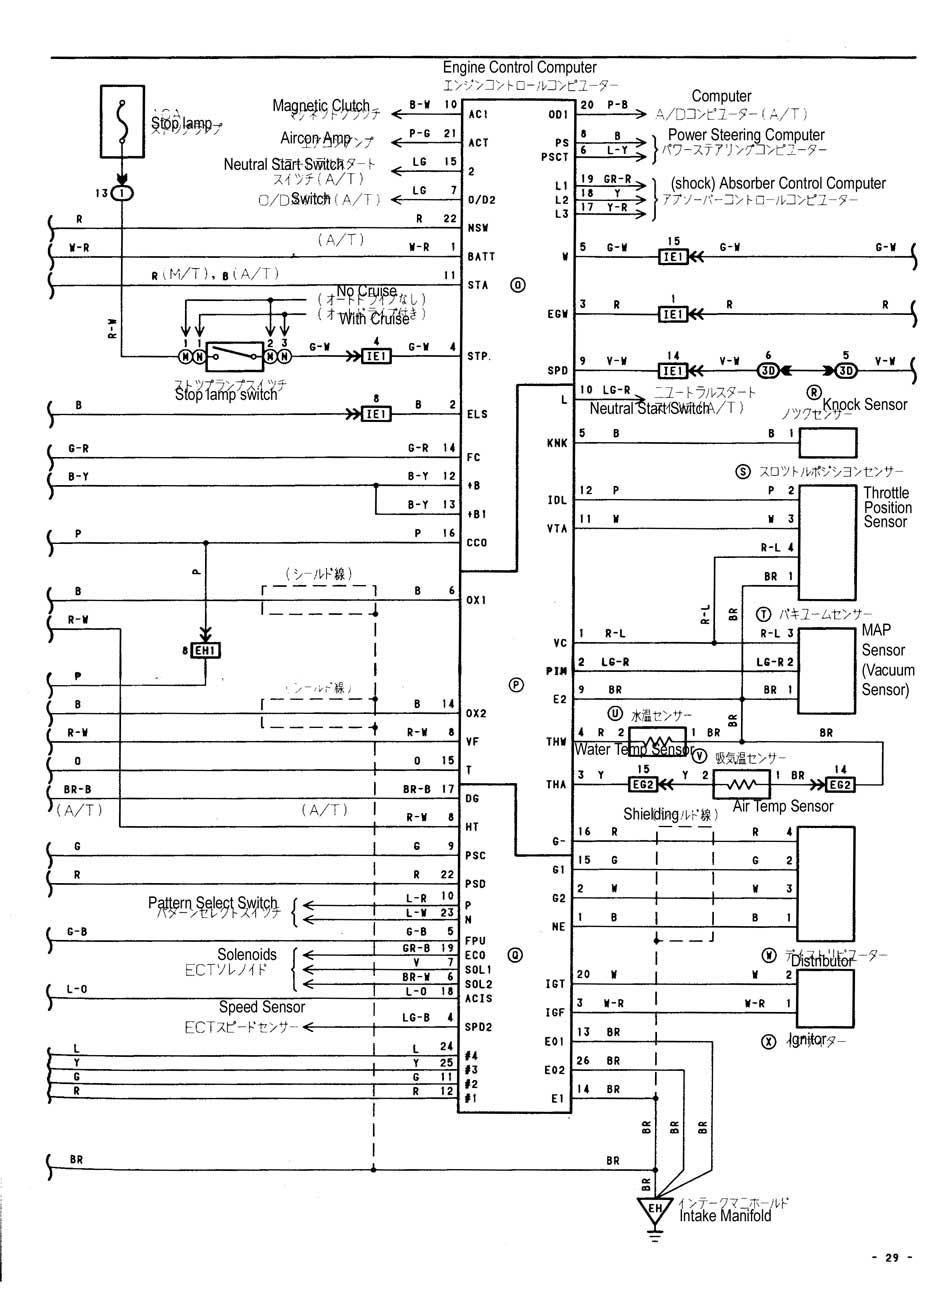 SW20 EWD1_web?resize=665%2C916 3sgte wiring diagram the best wiring diagram 2017 3sgte st215 wiring diagram at reclaimingppi.co